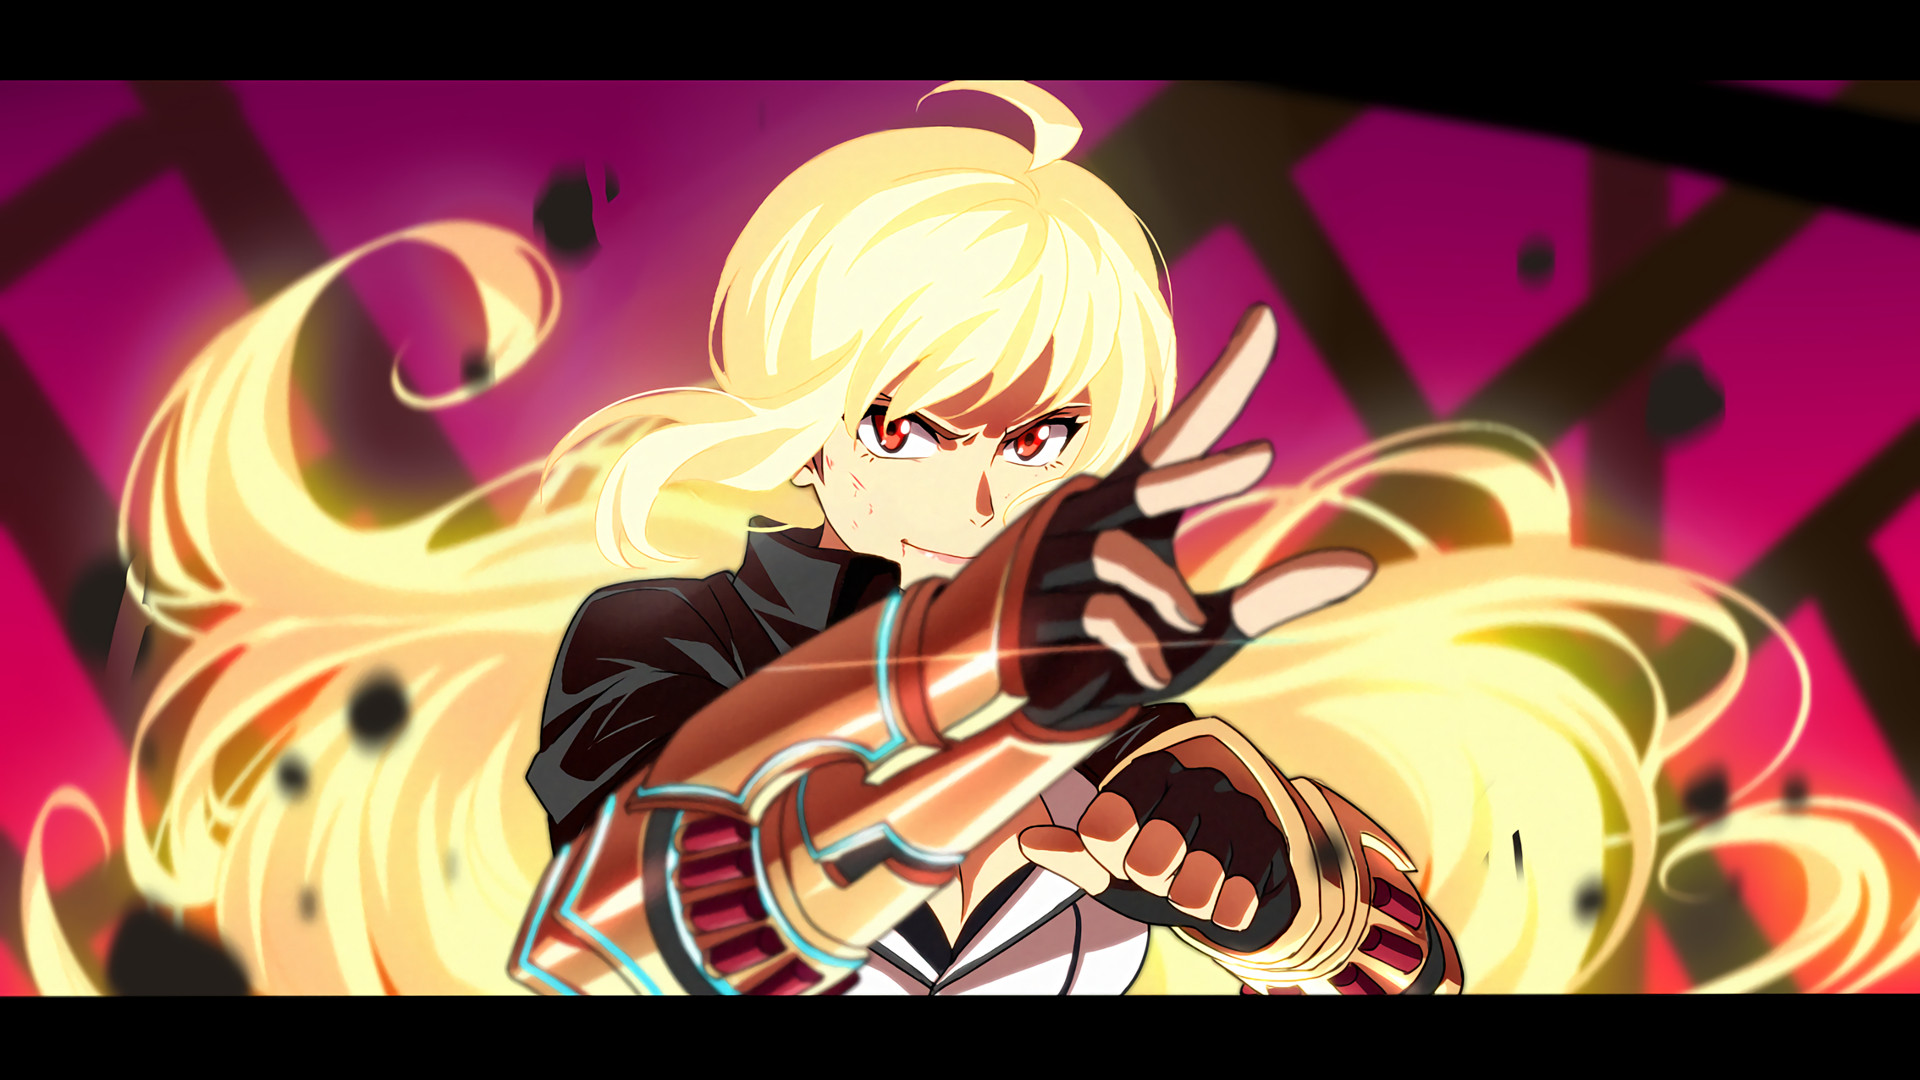 Anime – RWBY Yang Xiao Long Hunter Outfit (RWBY) Bakgrund